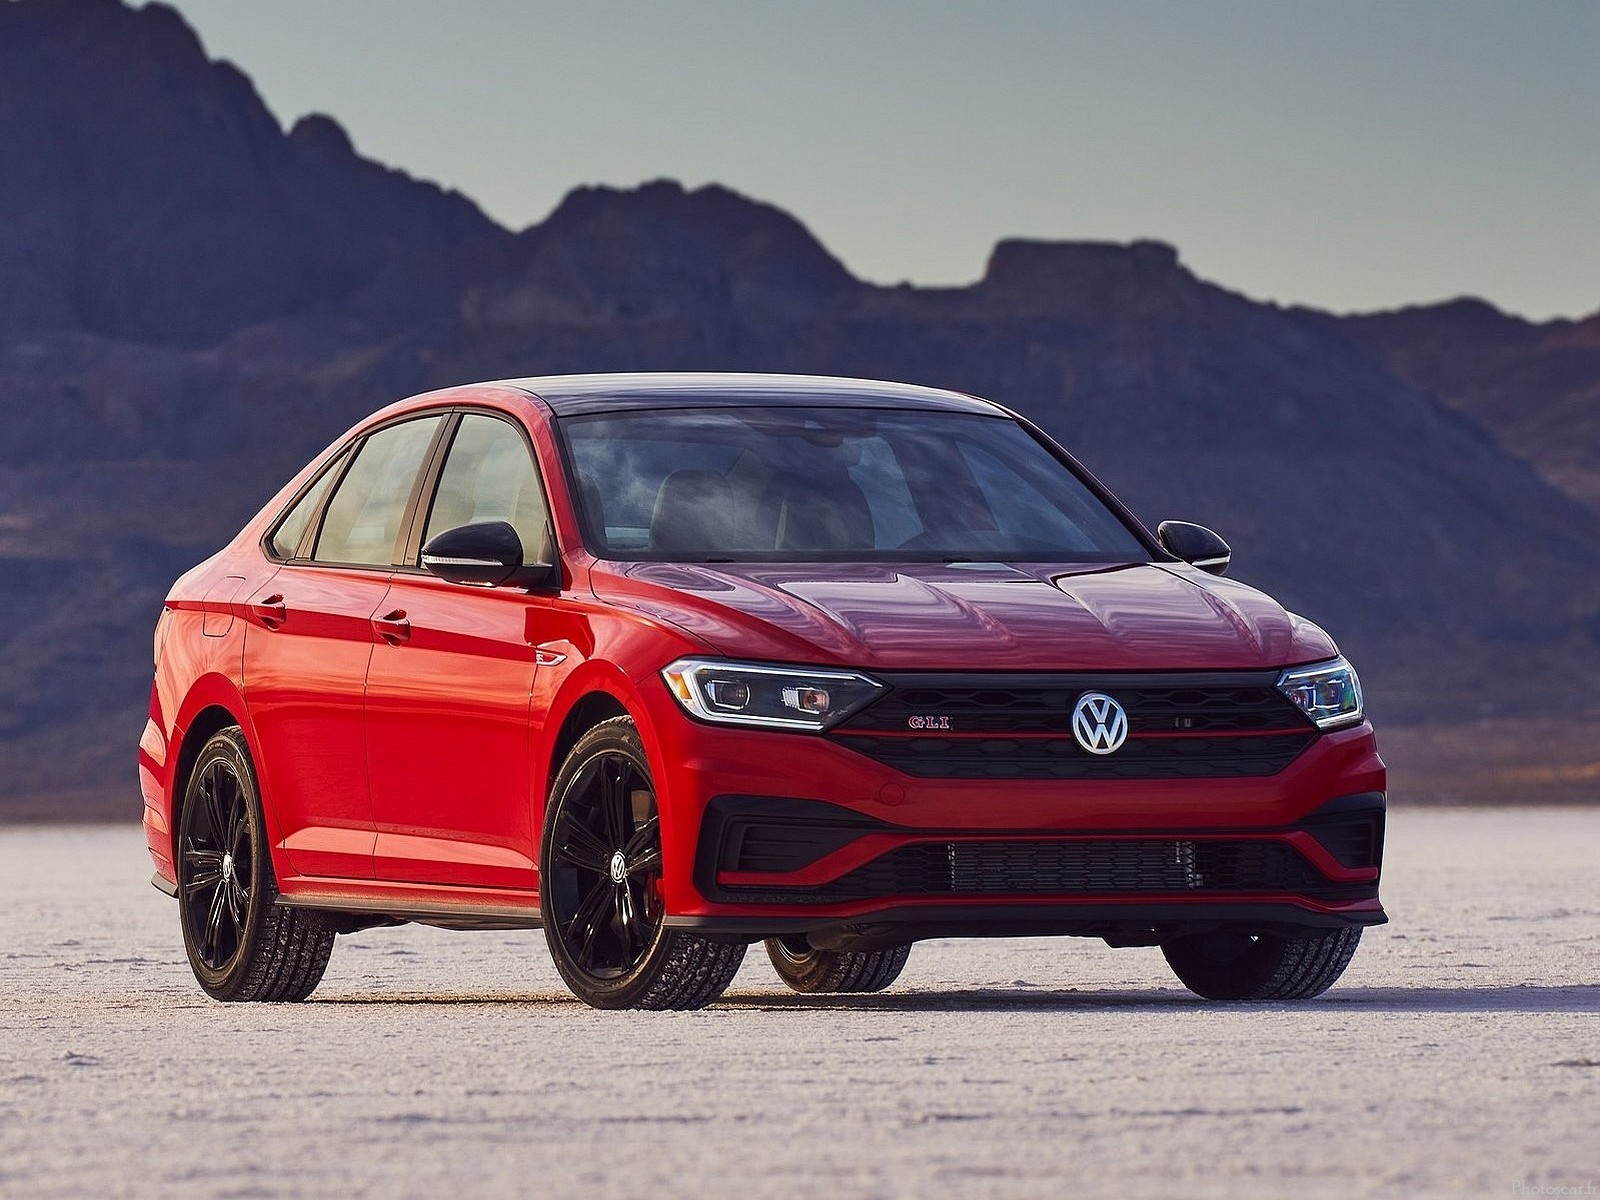 Volkswagen Jetta GLI 2021